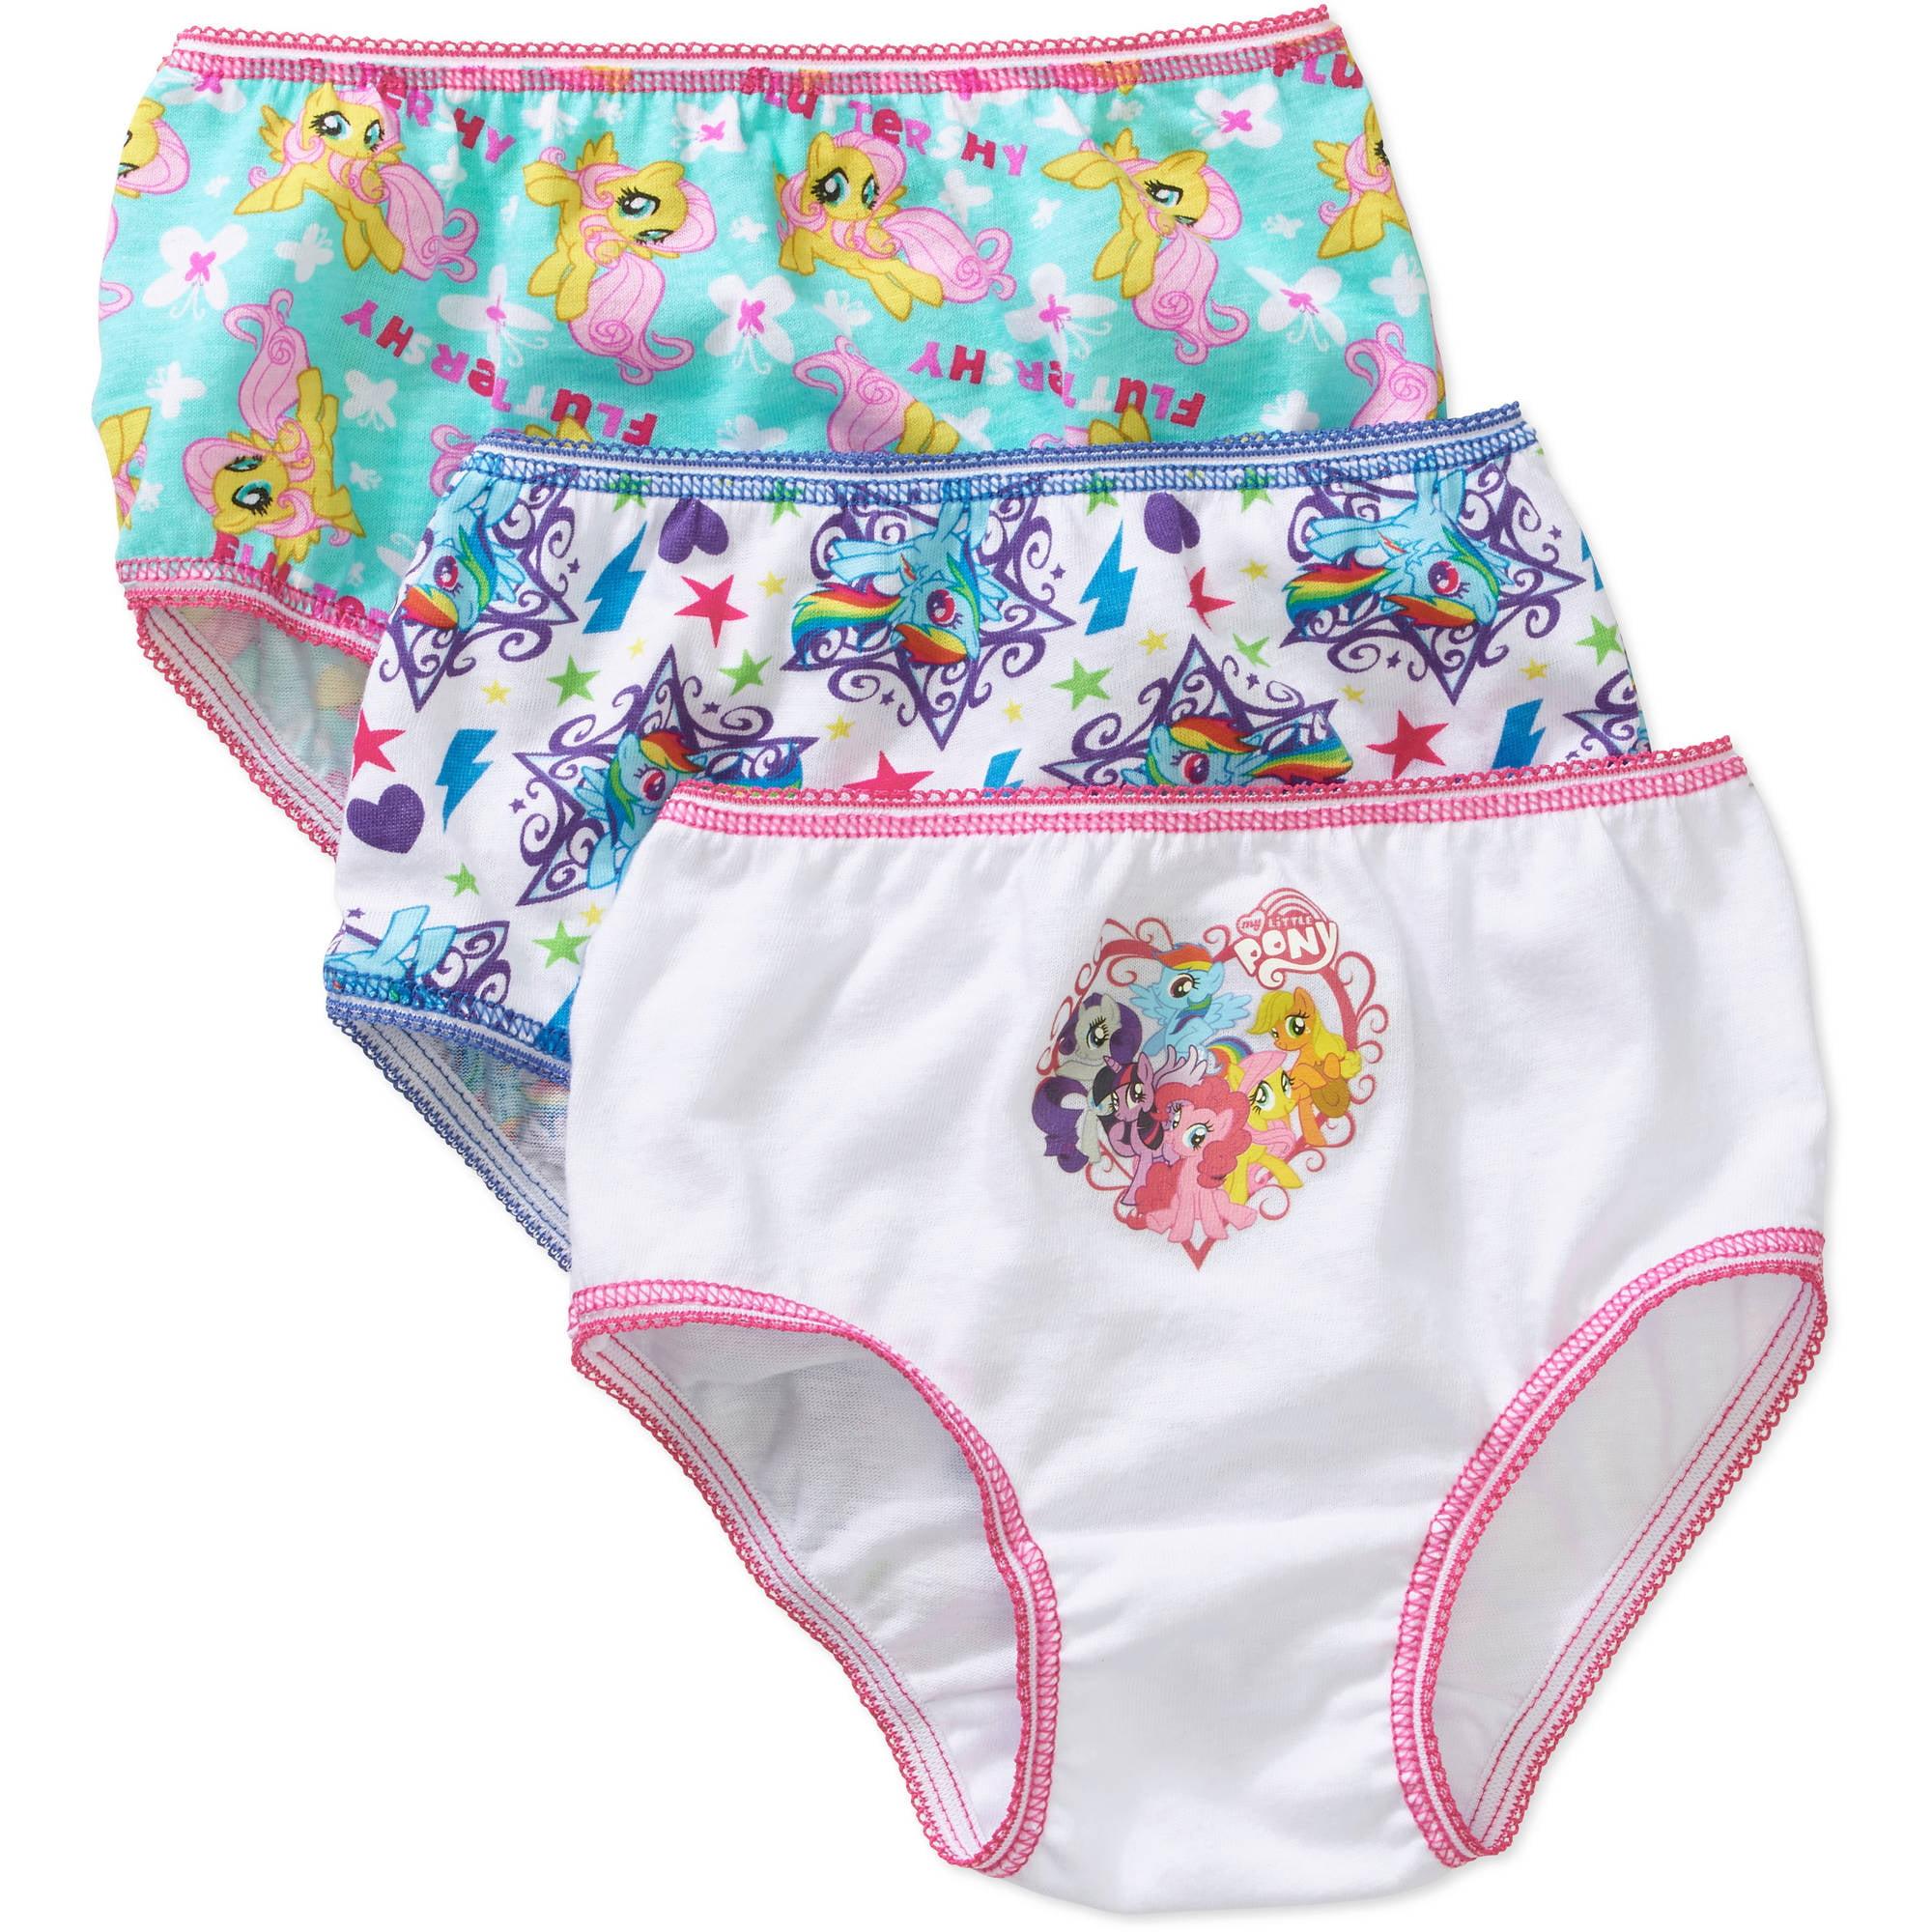 My Little Pony - My Little Pony Underwear Panties, 3 Pack